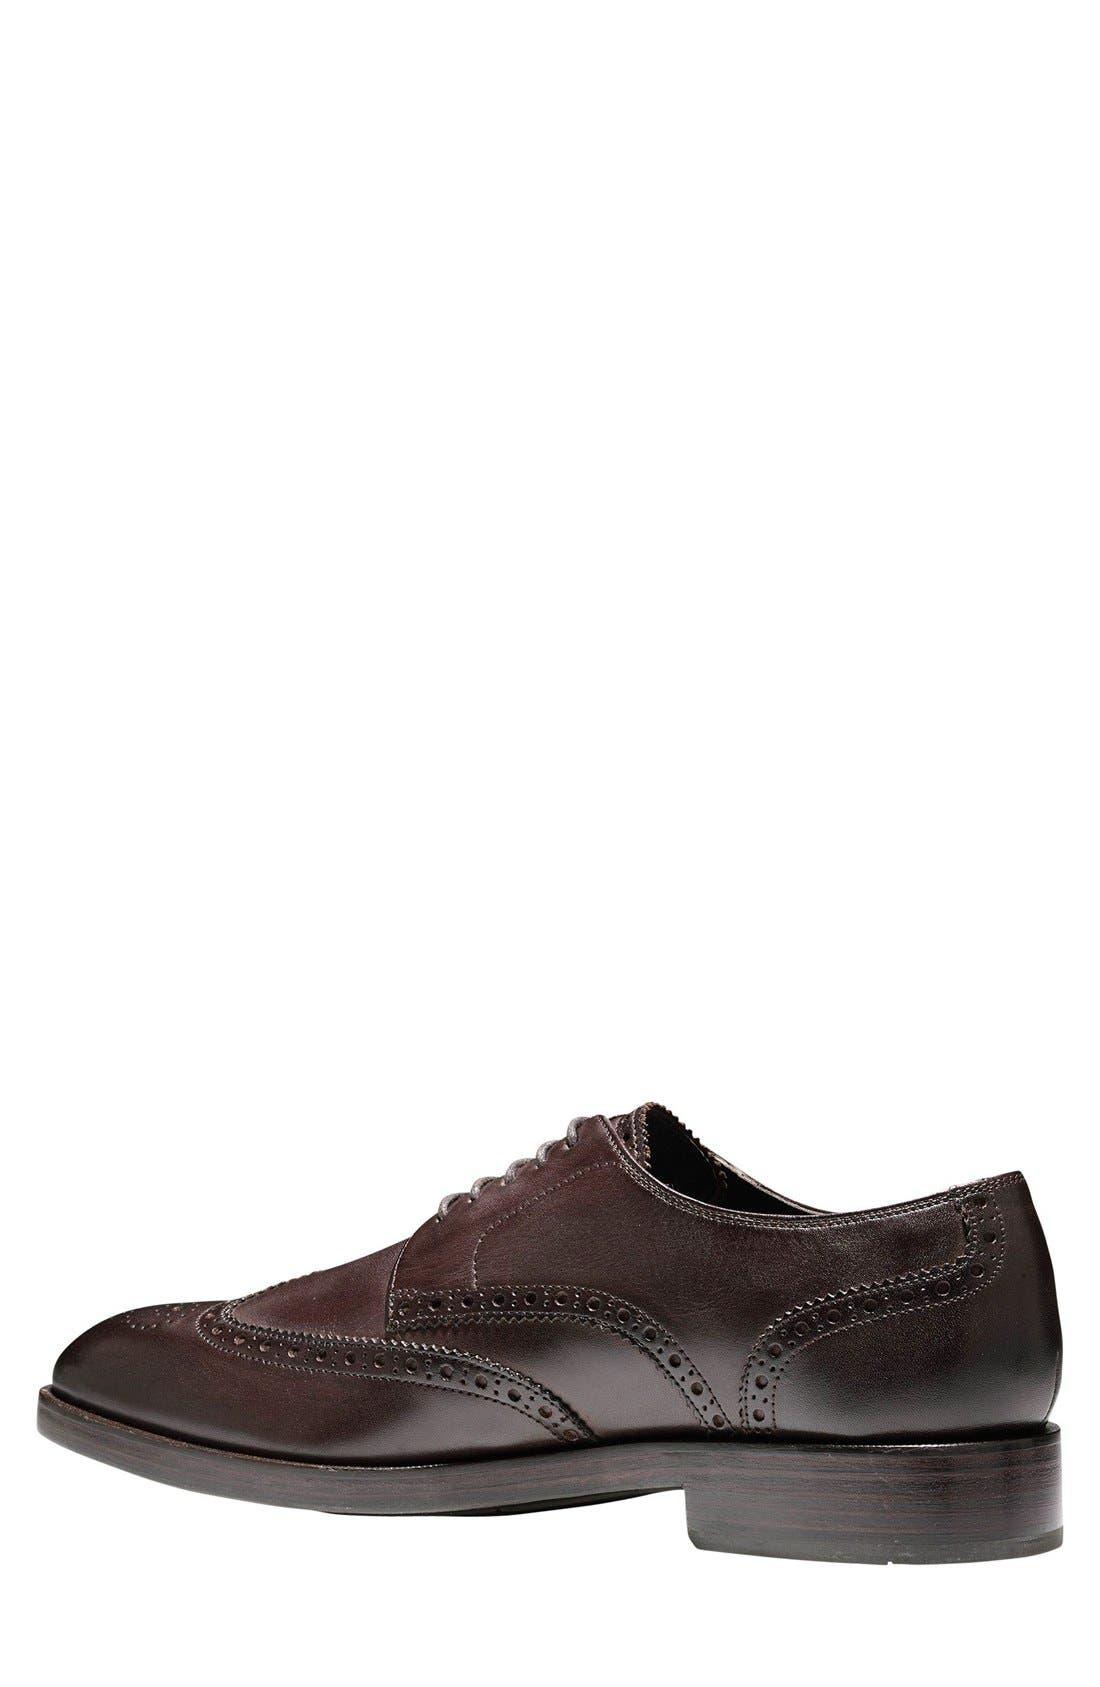 'Harrison Grand' Wingtip,                             Alternate thumbnail 3, color,                             Dark Brown Leather